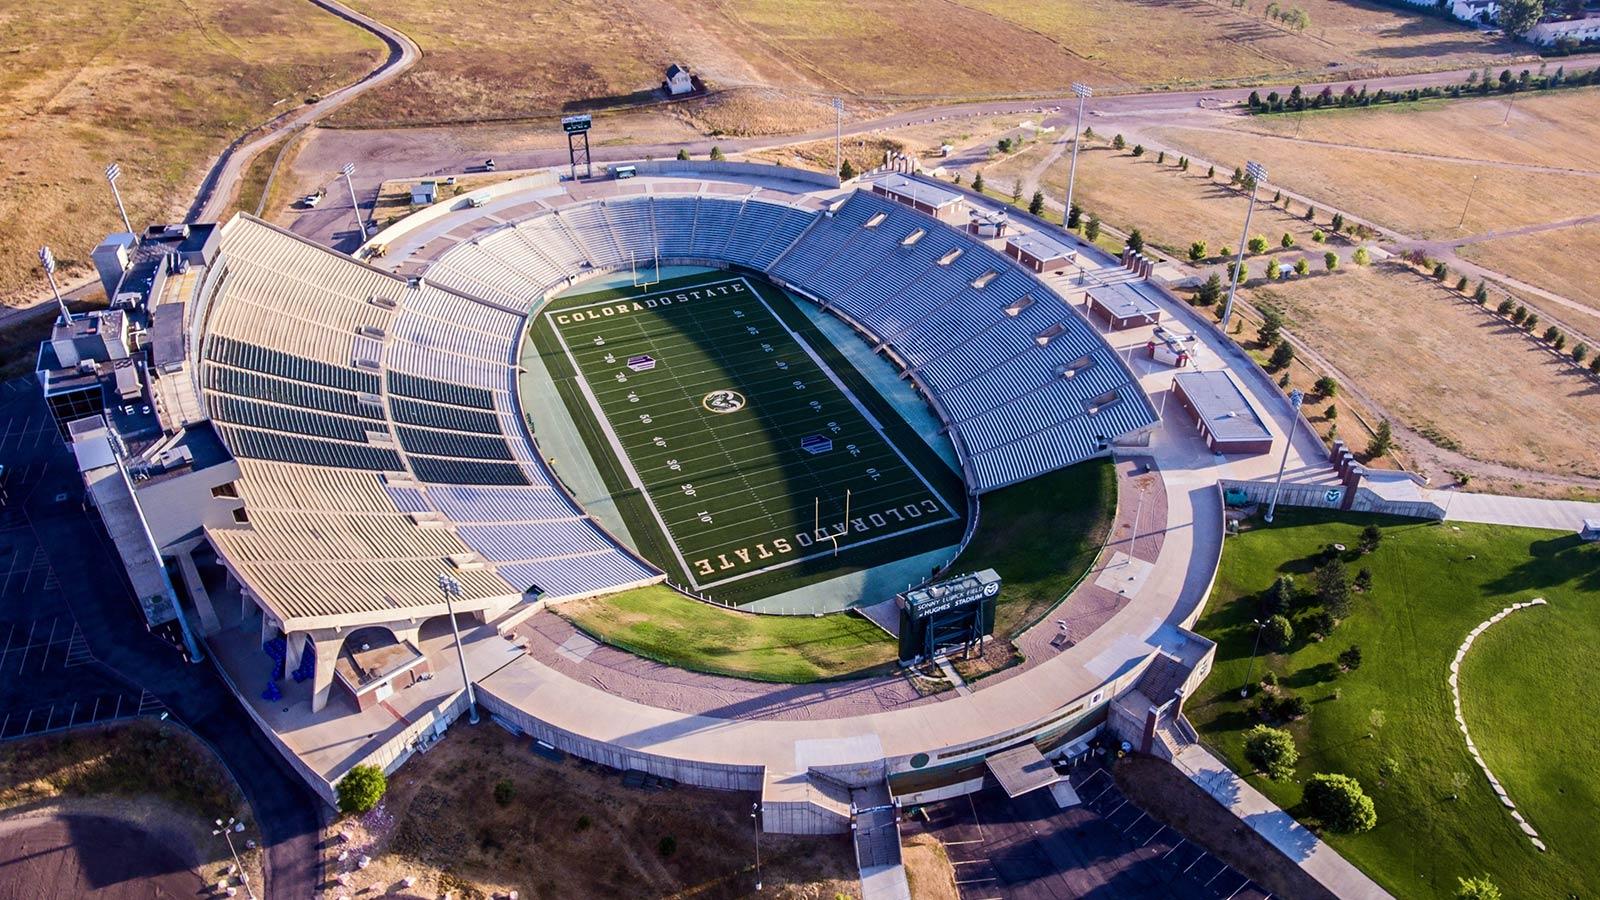 Aerial view of the CSU football stadium